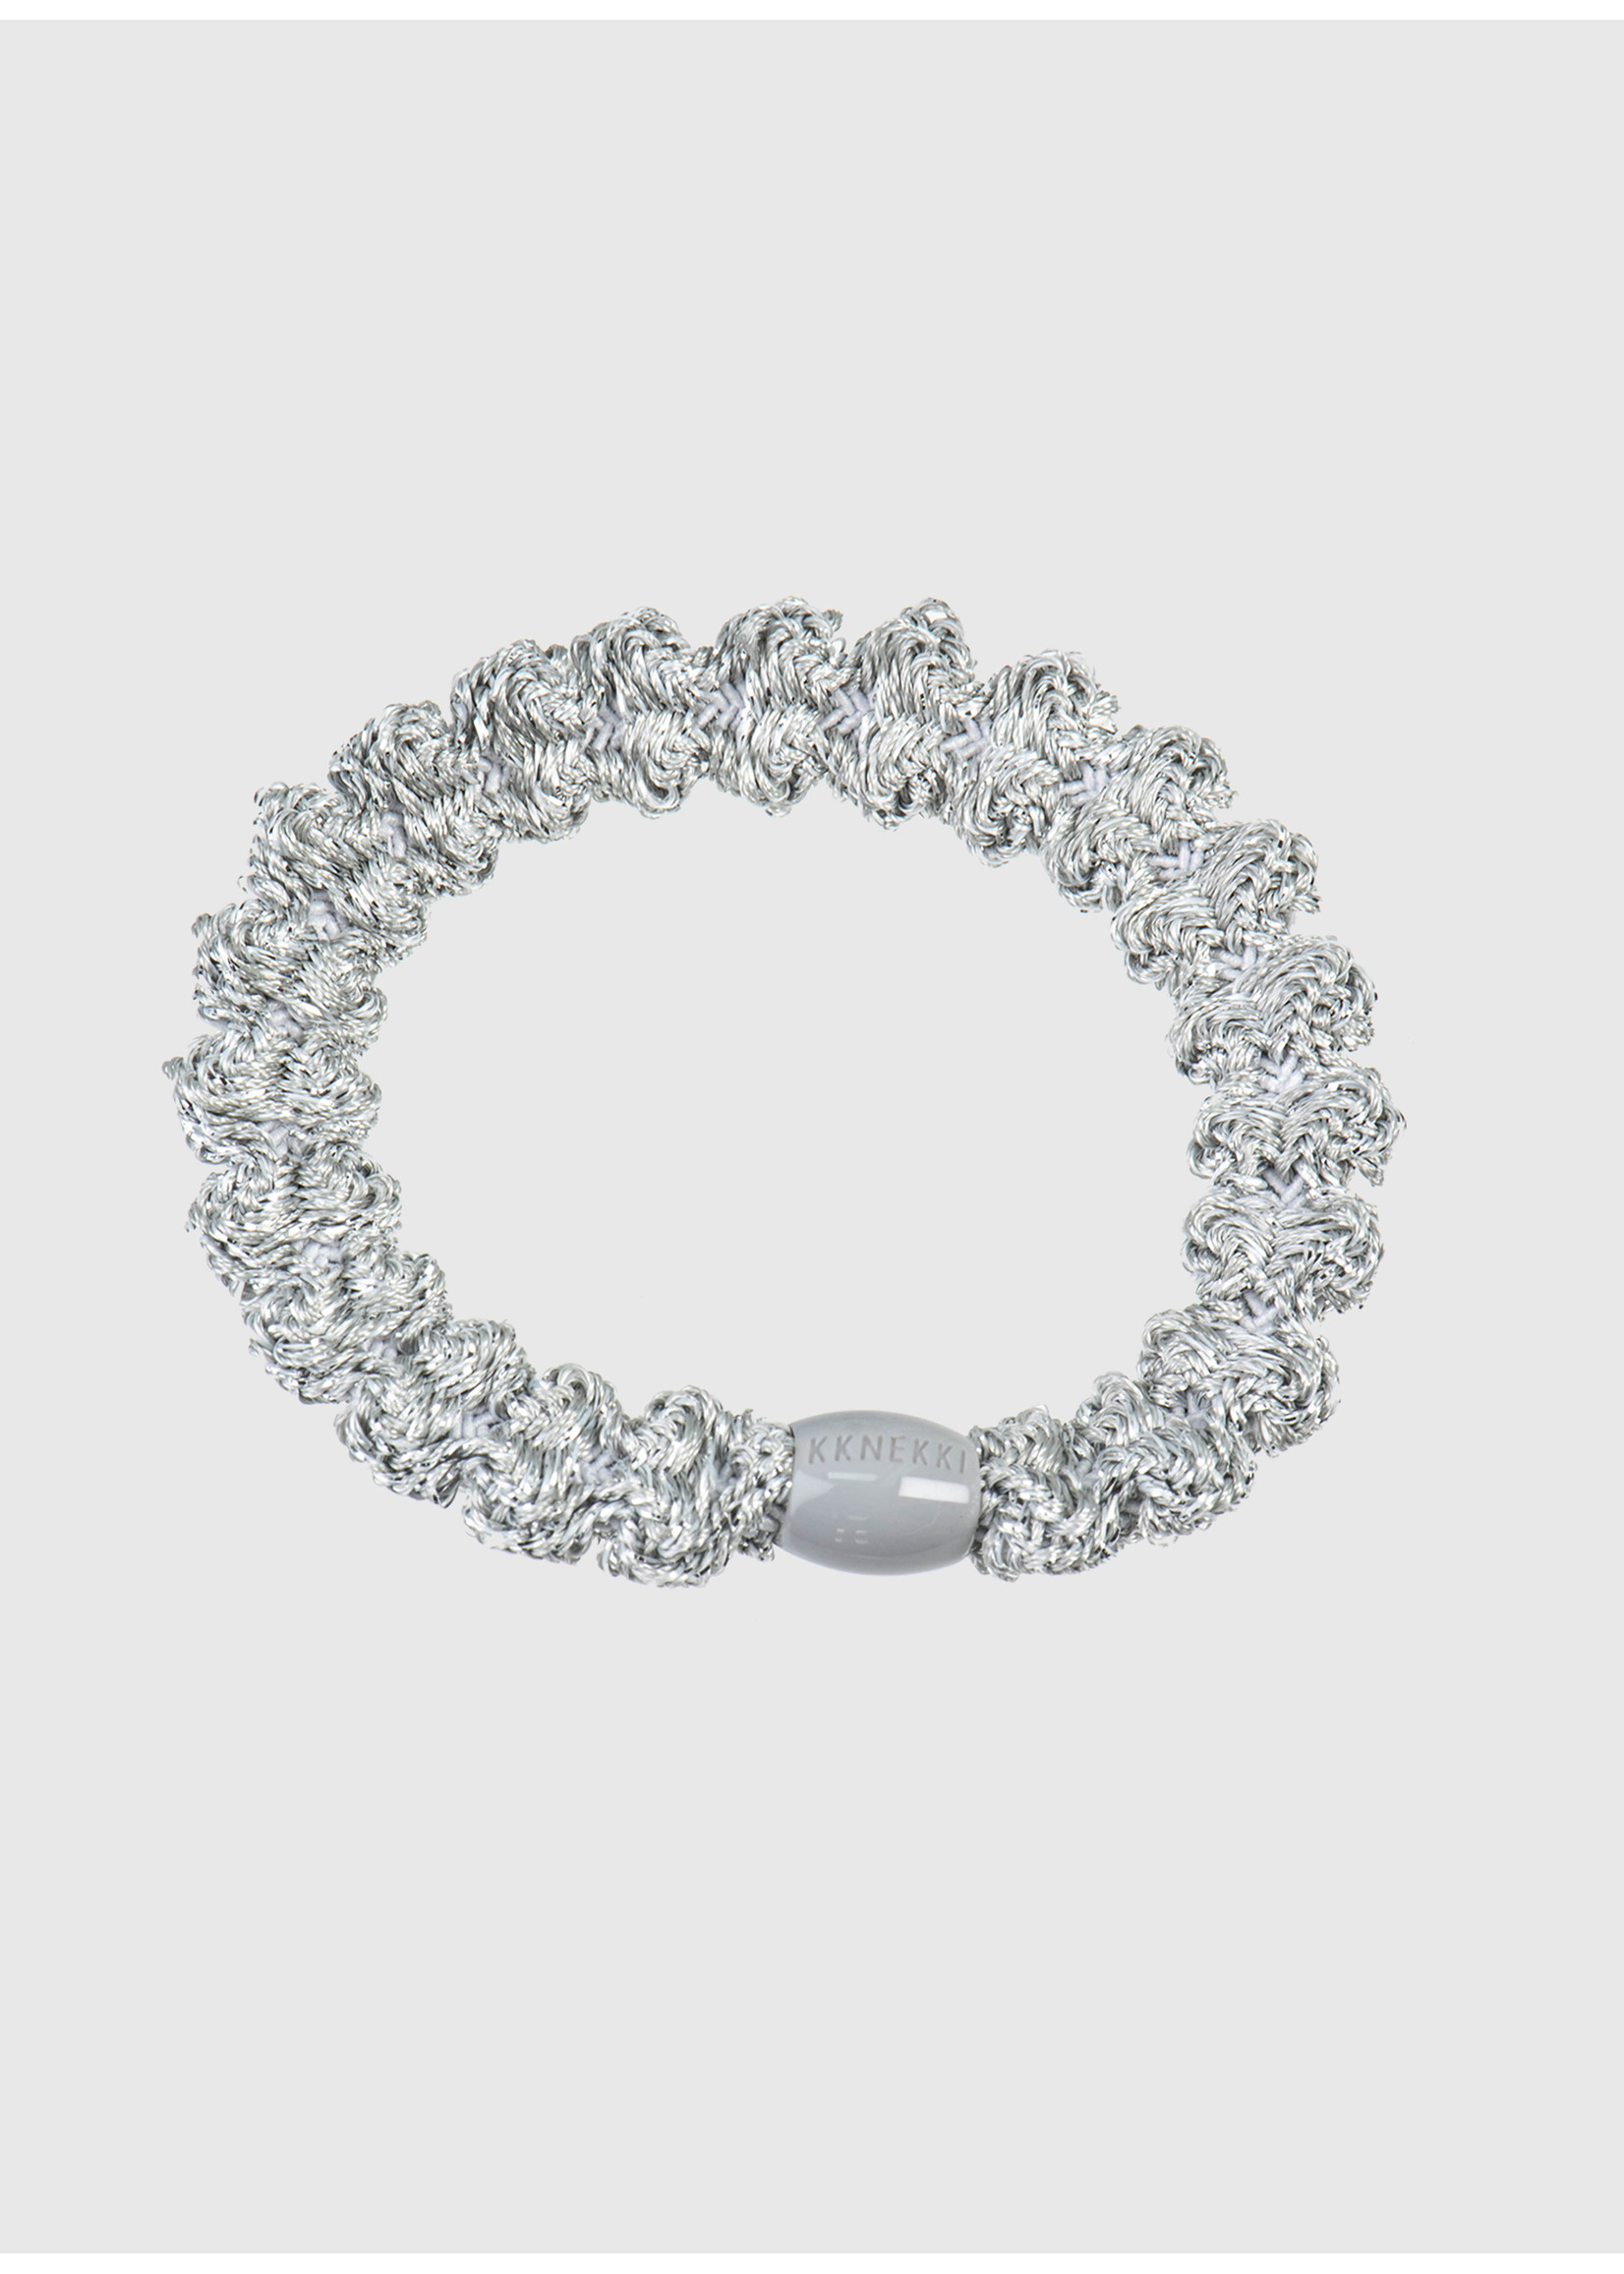 Kknekki by Bon Dep Lace silver glitter